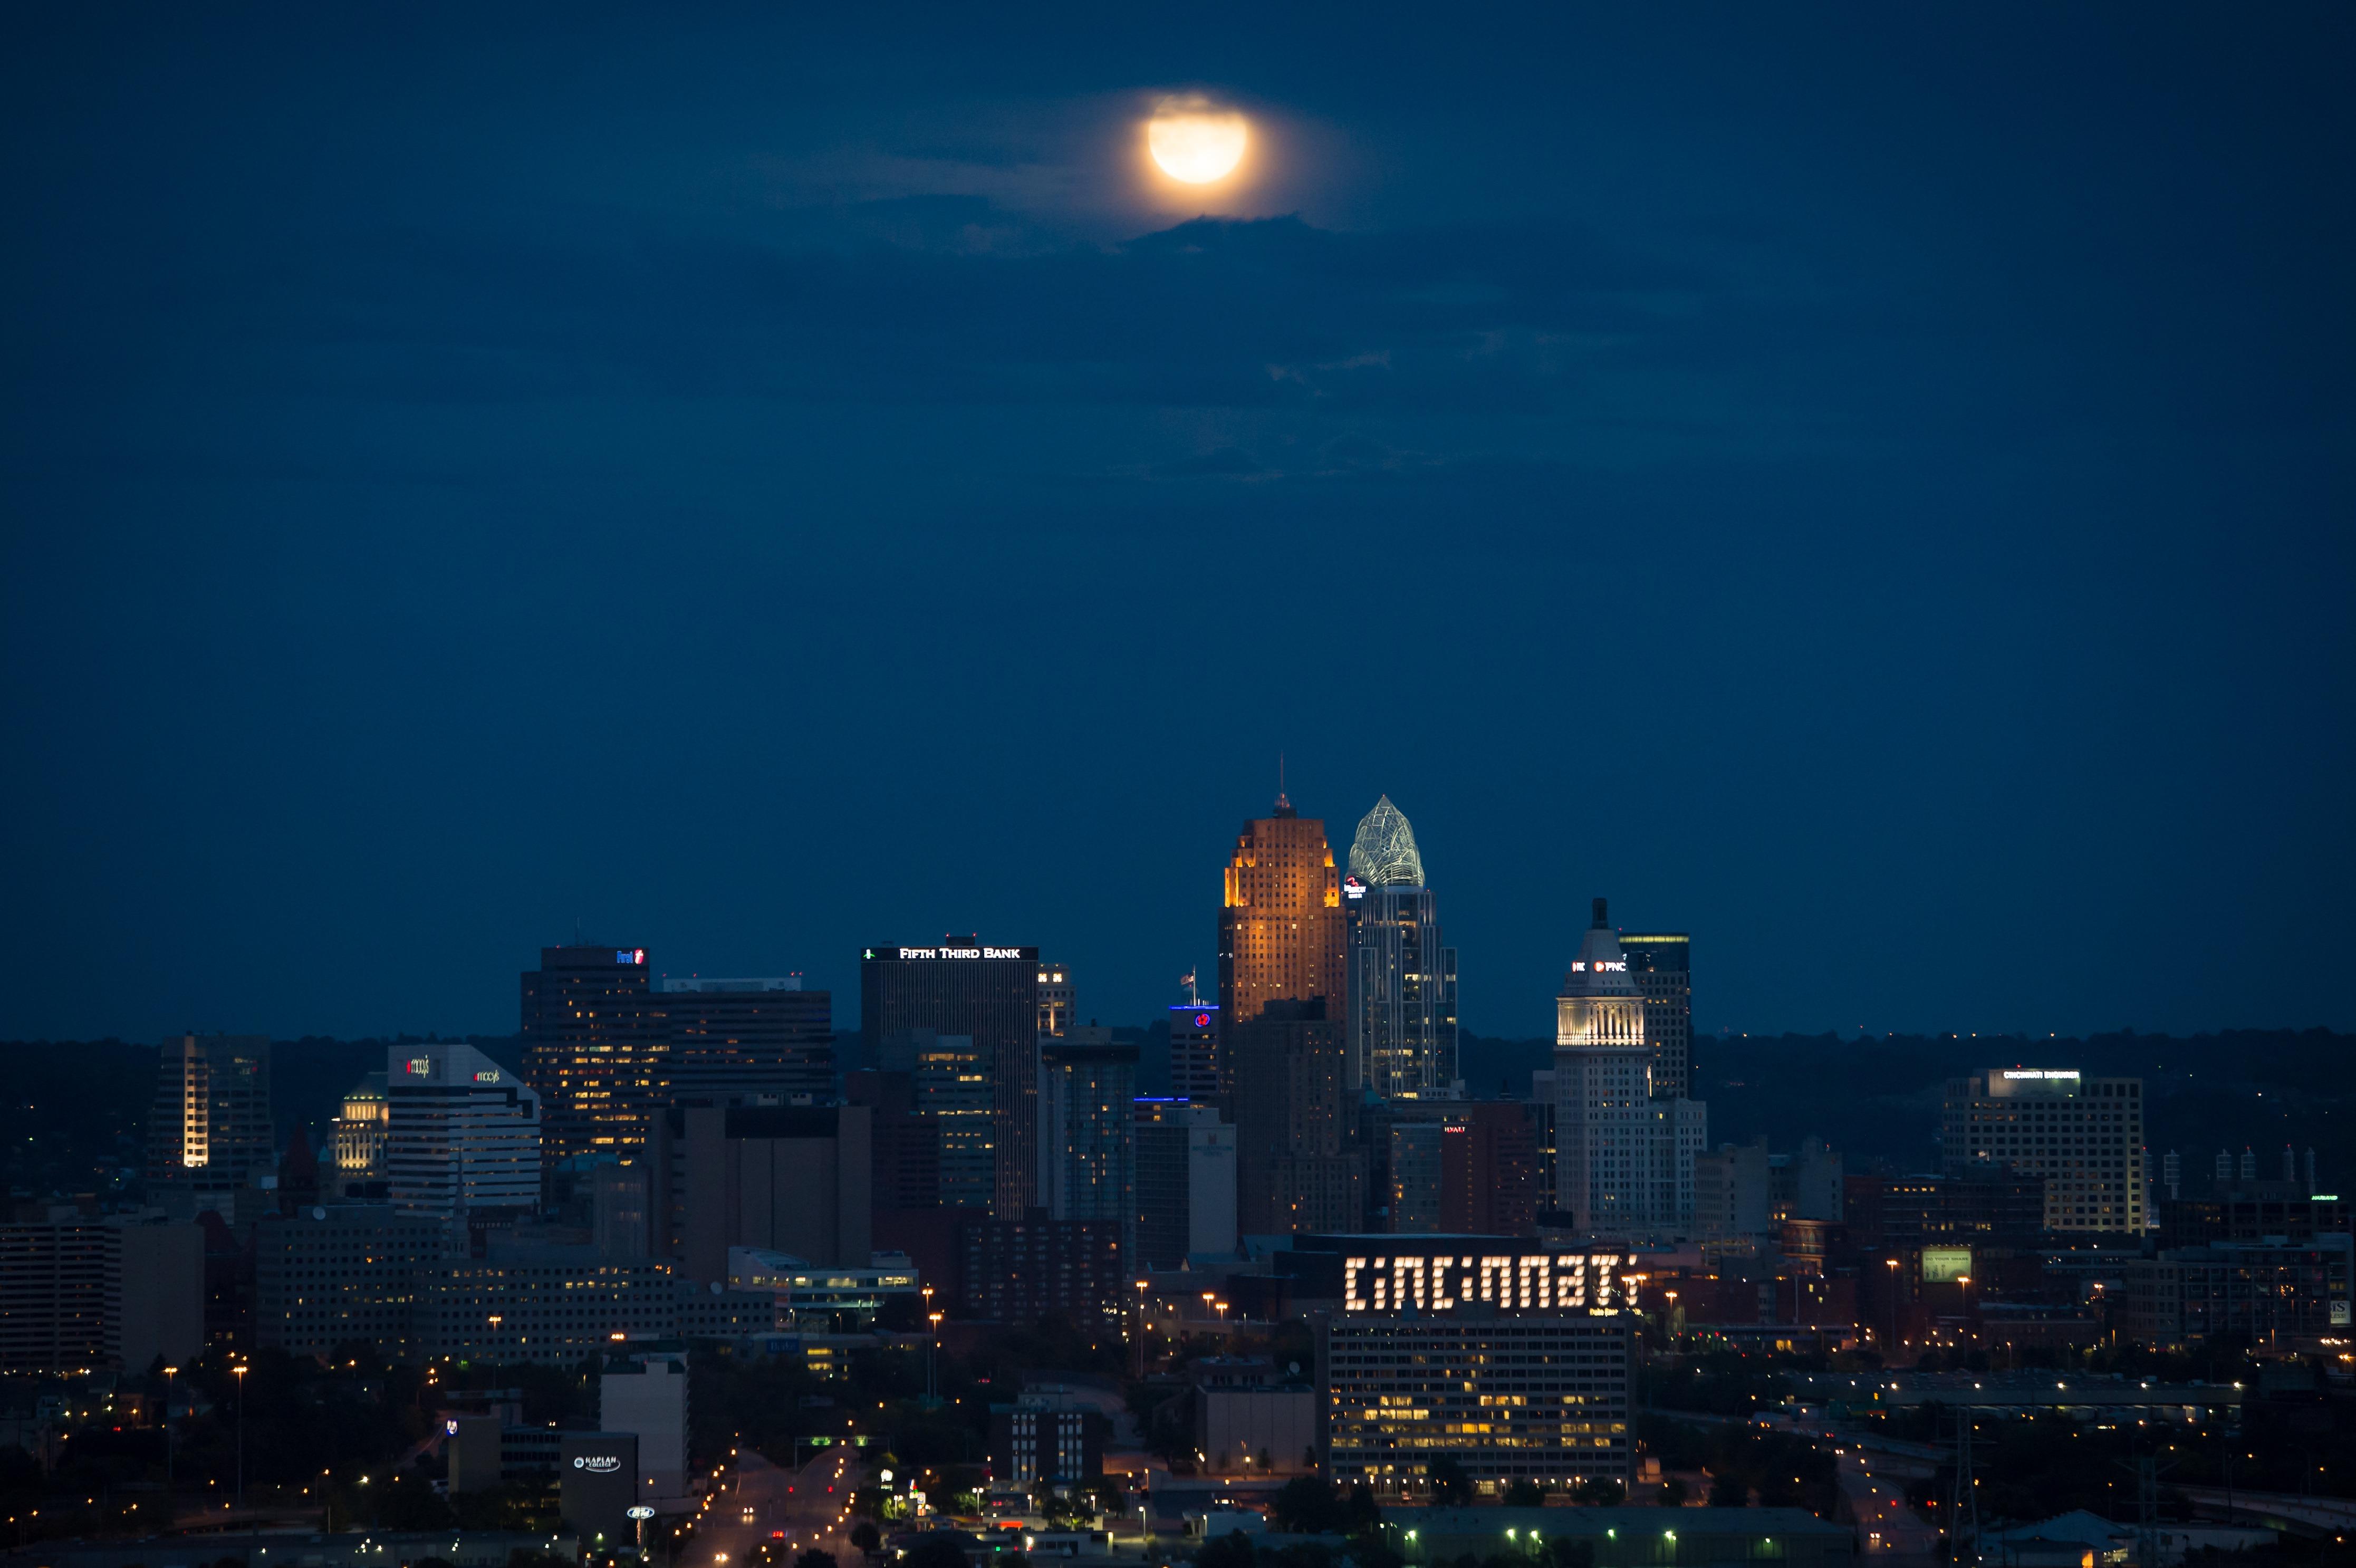 Horizon Architecture Sky Skyline Night Dawn City Urban Cityscape Dusk Evening Moon Lights Skyscrapers Buildings Ohio